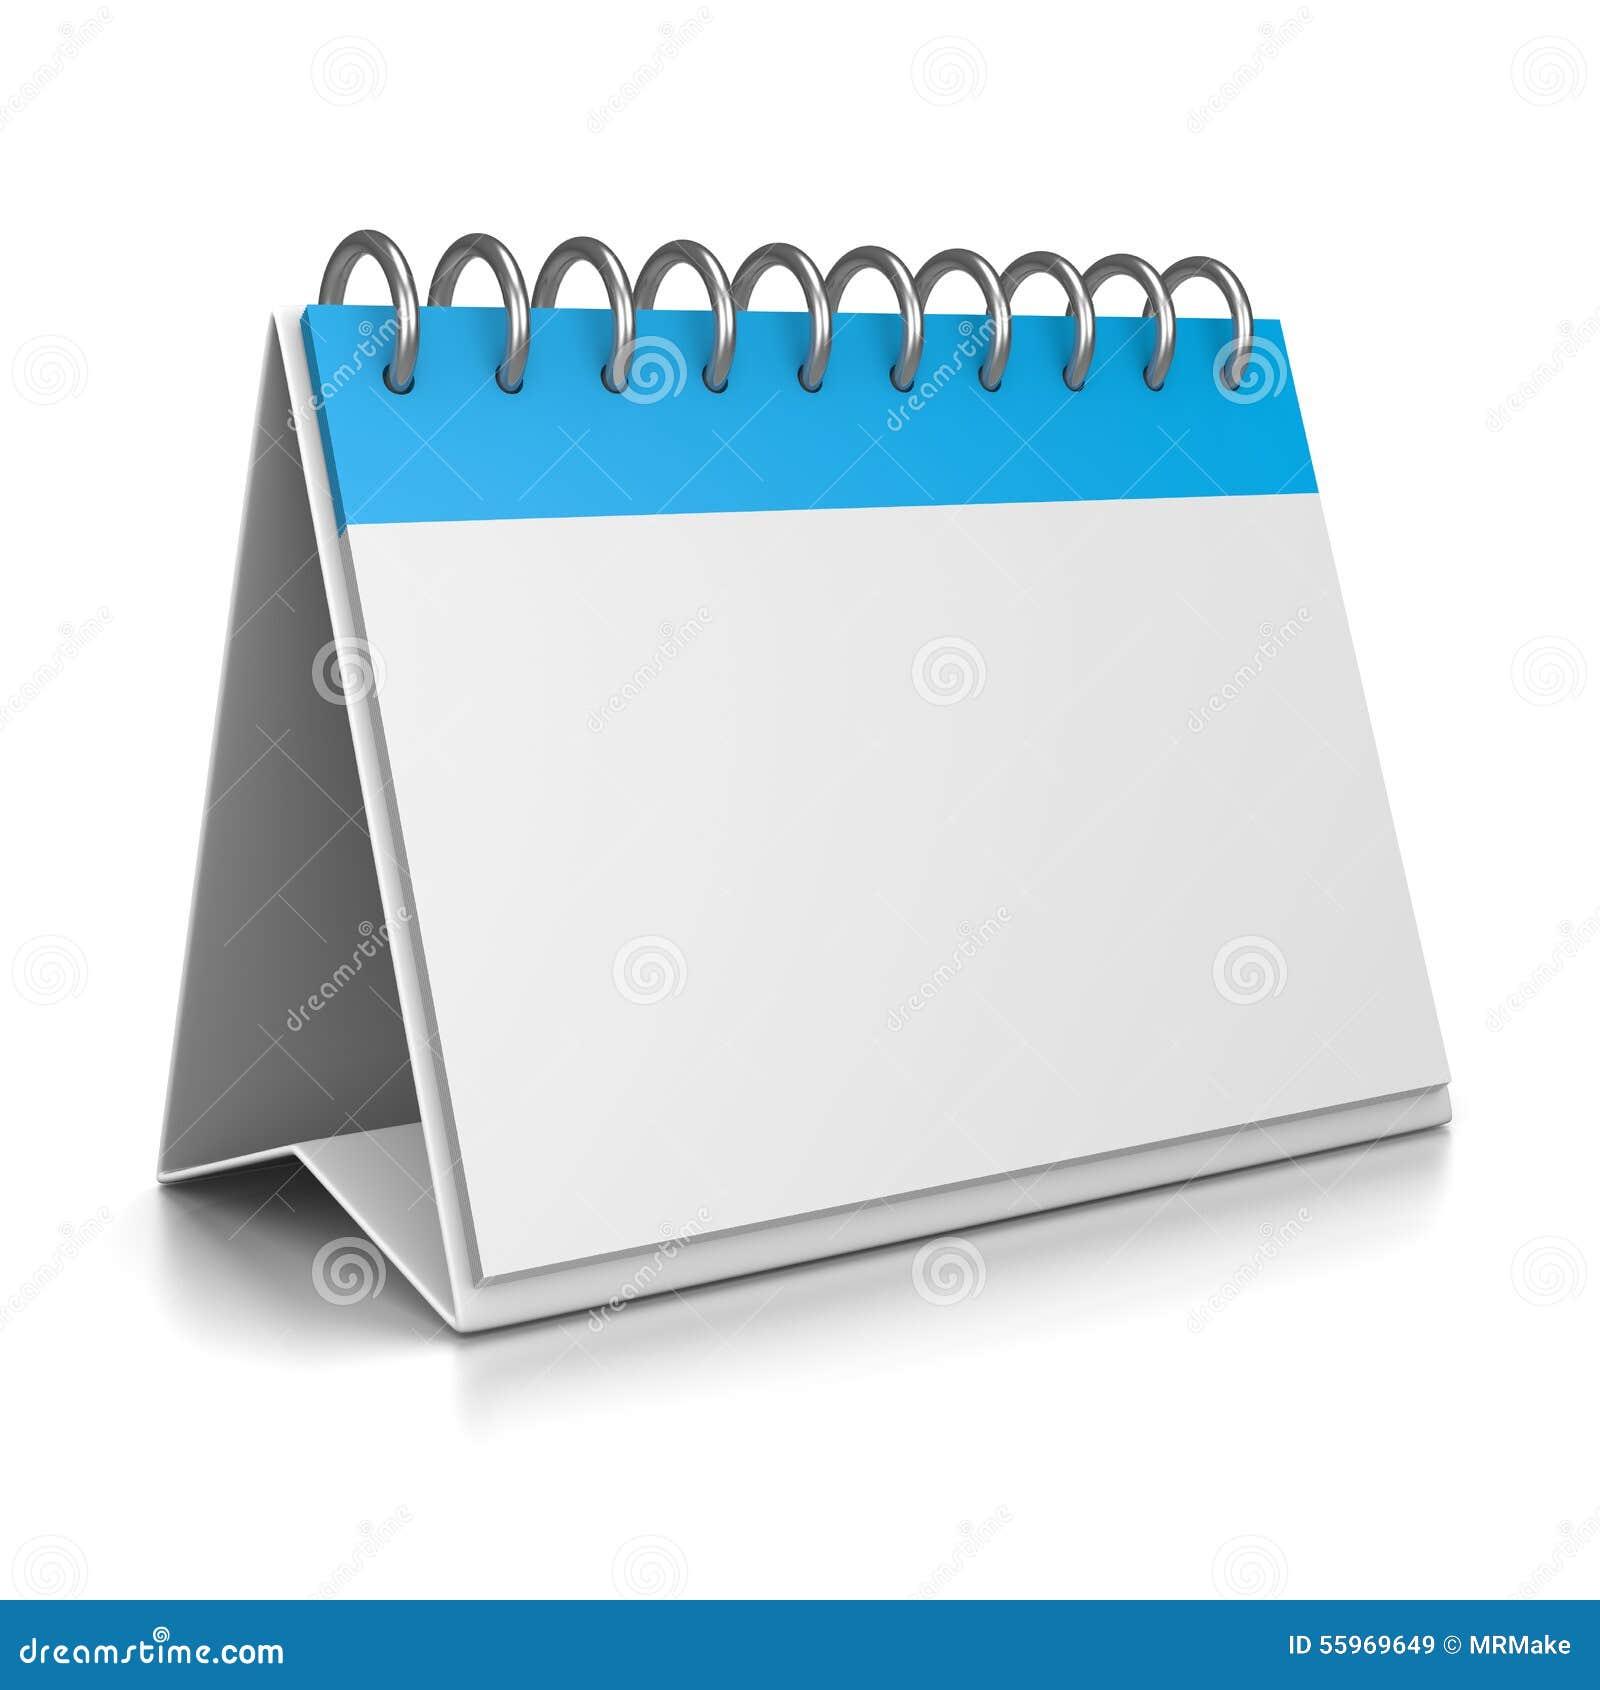 Calendar Illustration : Desk calendar d template stock illustration